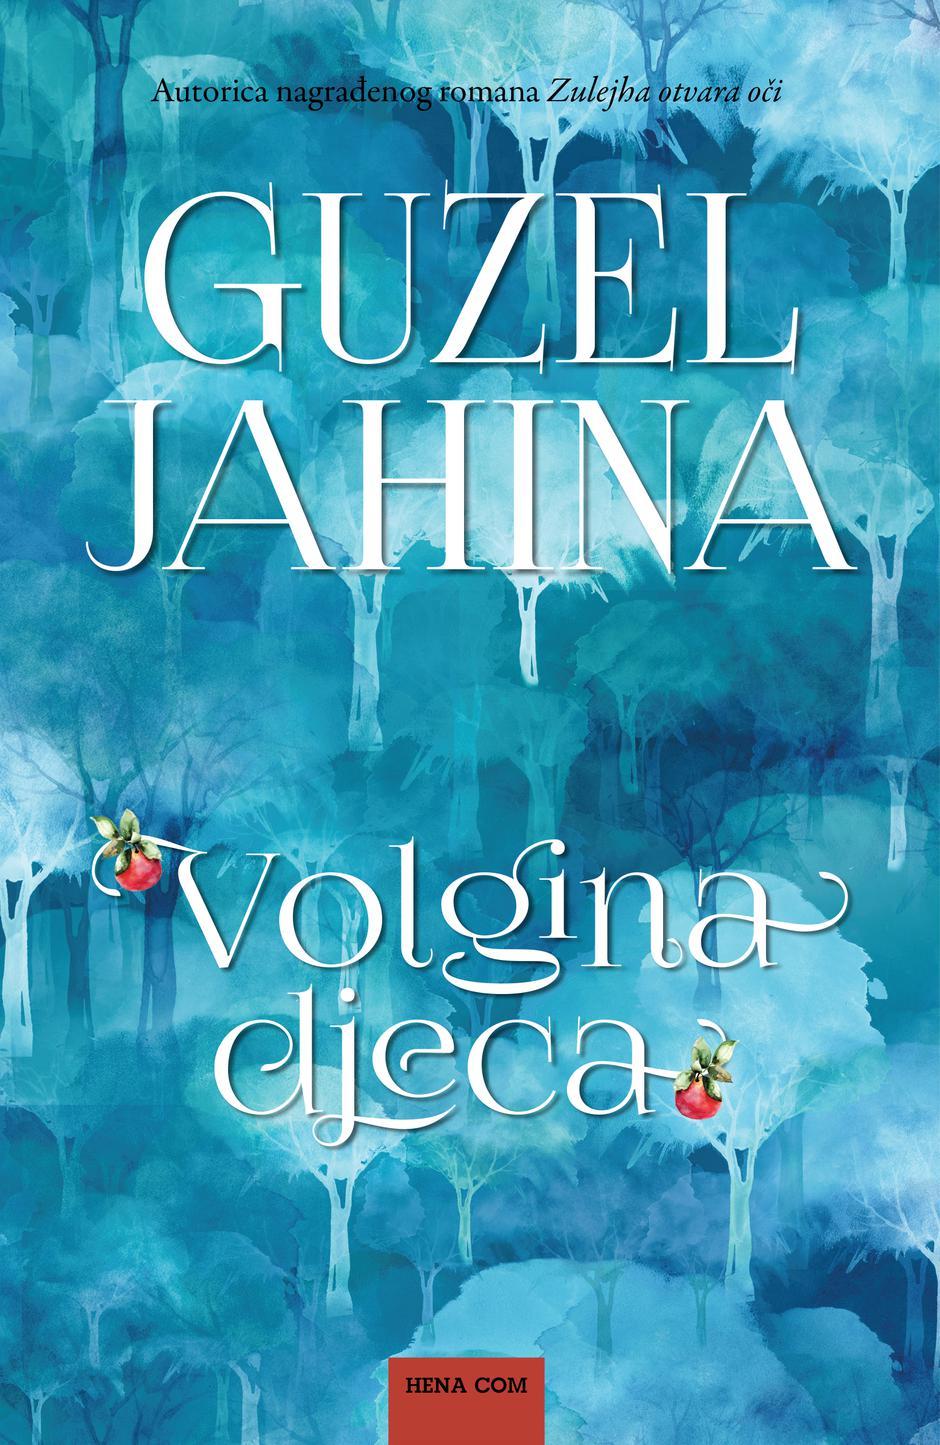 Guzel Jahina | Author: Hena Com